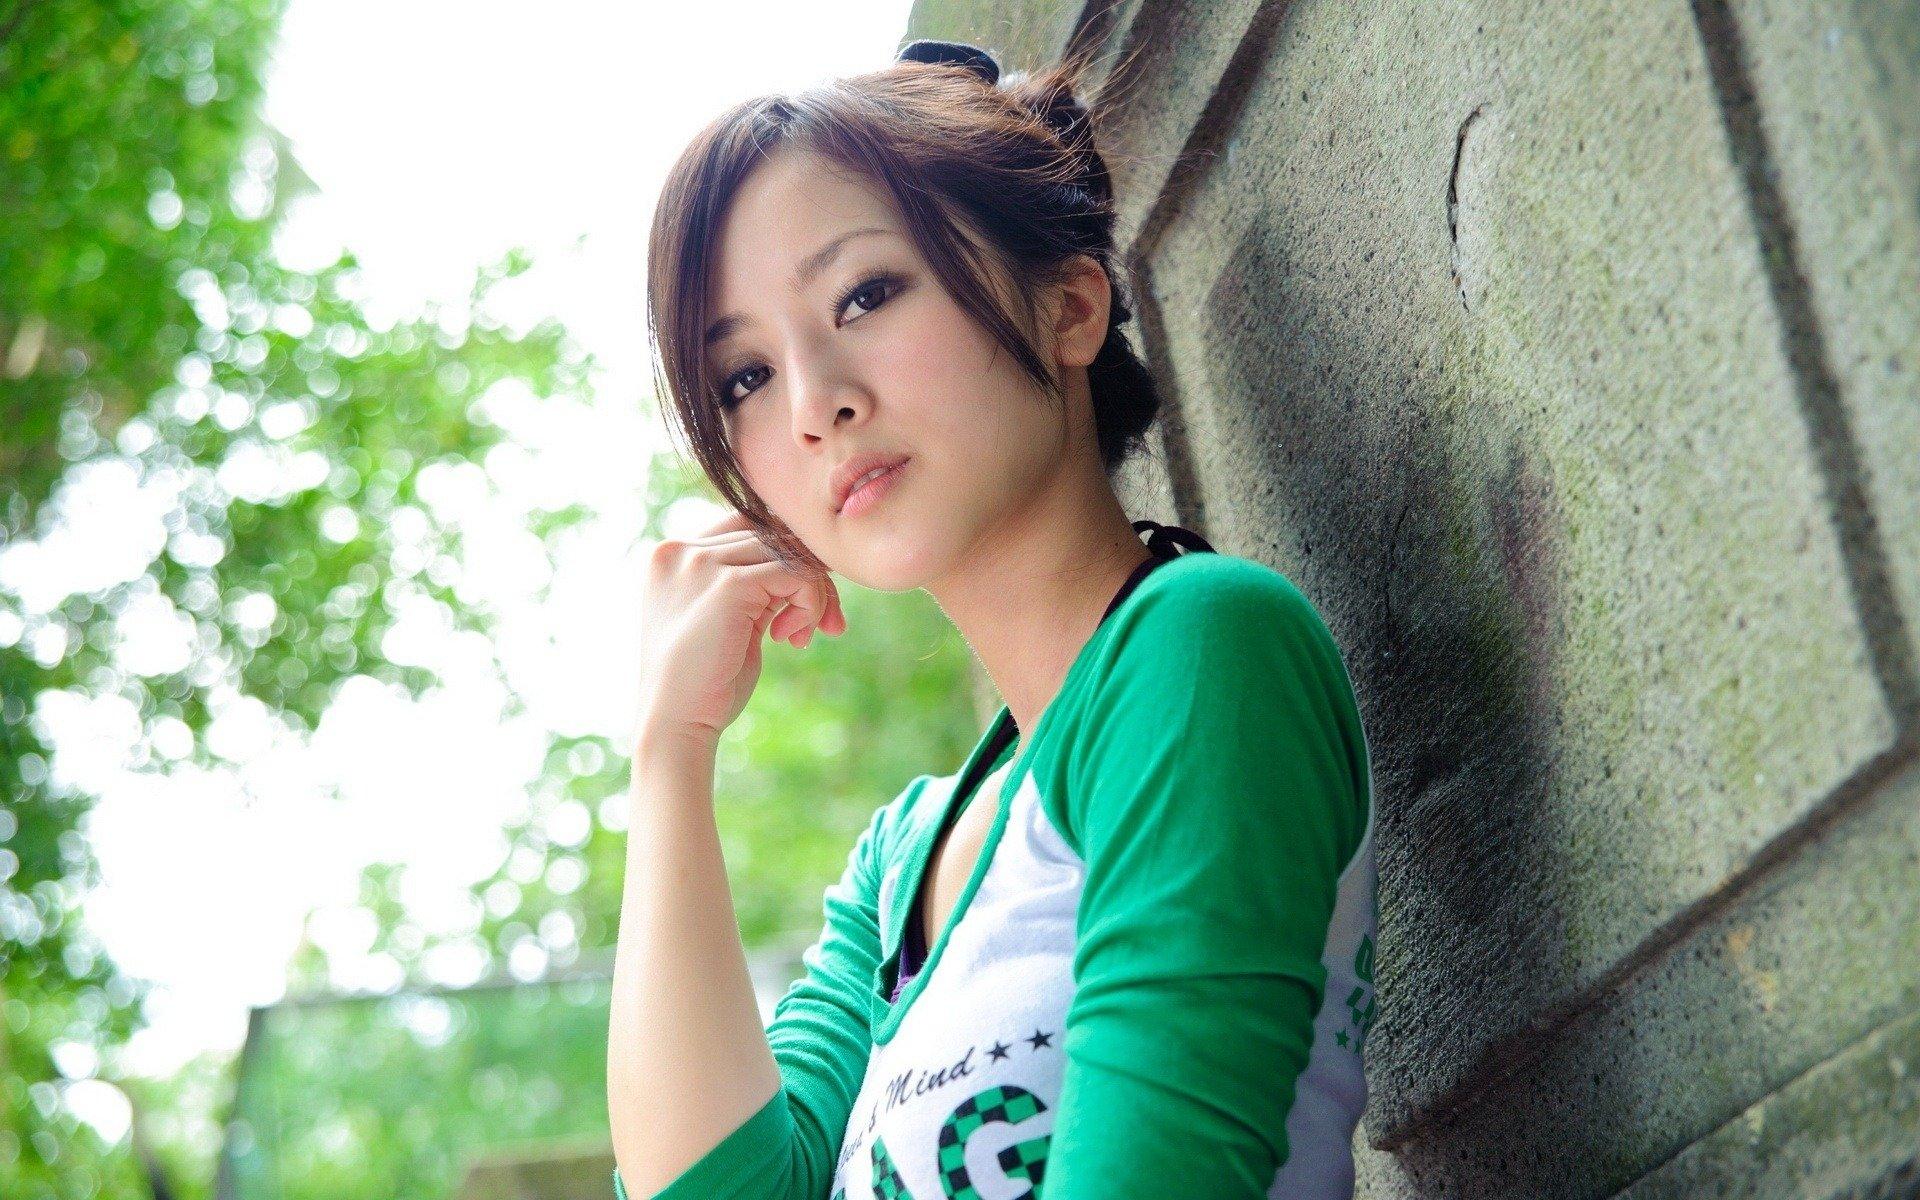 Chinese Cute Girl Hd Wallpaper Mikako Zhang Kaijie Full Hd Wallpaper And Background